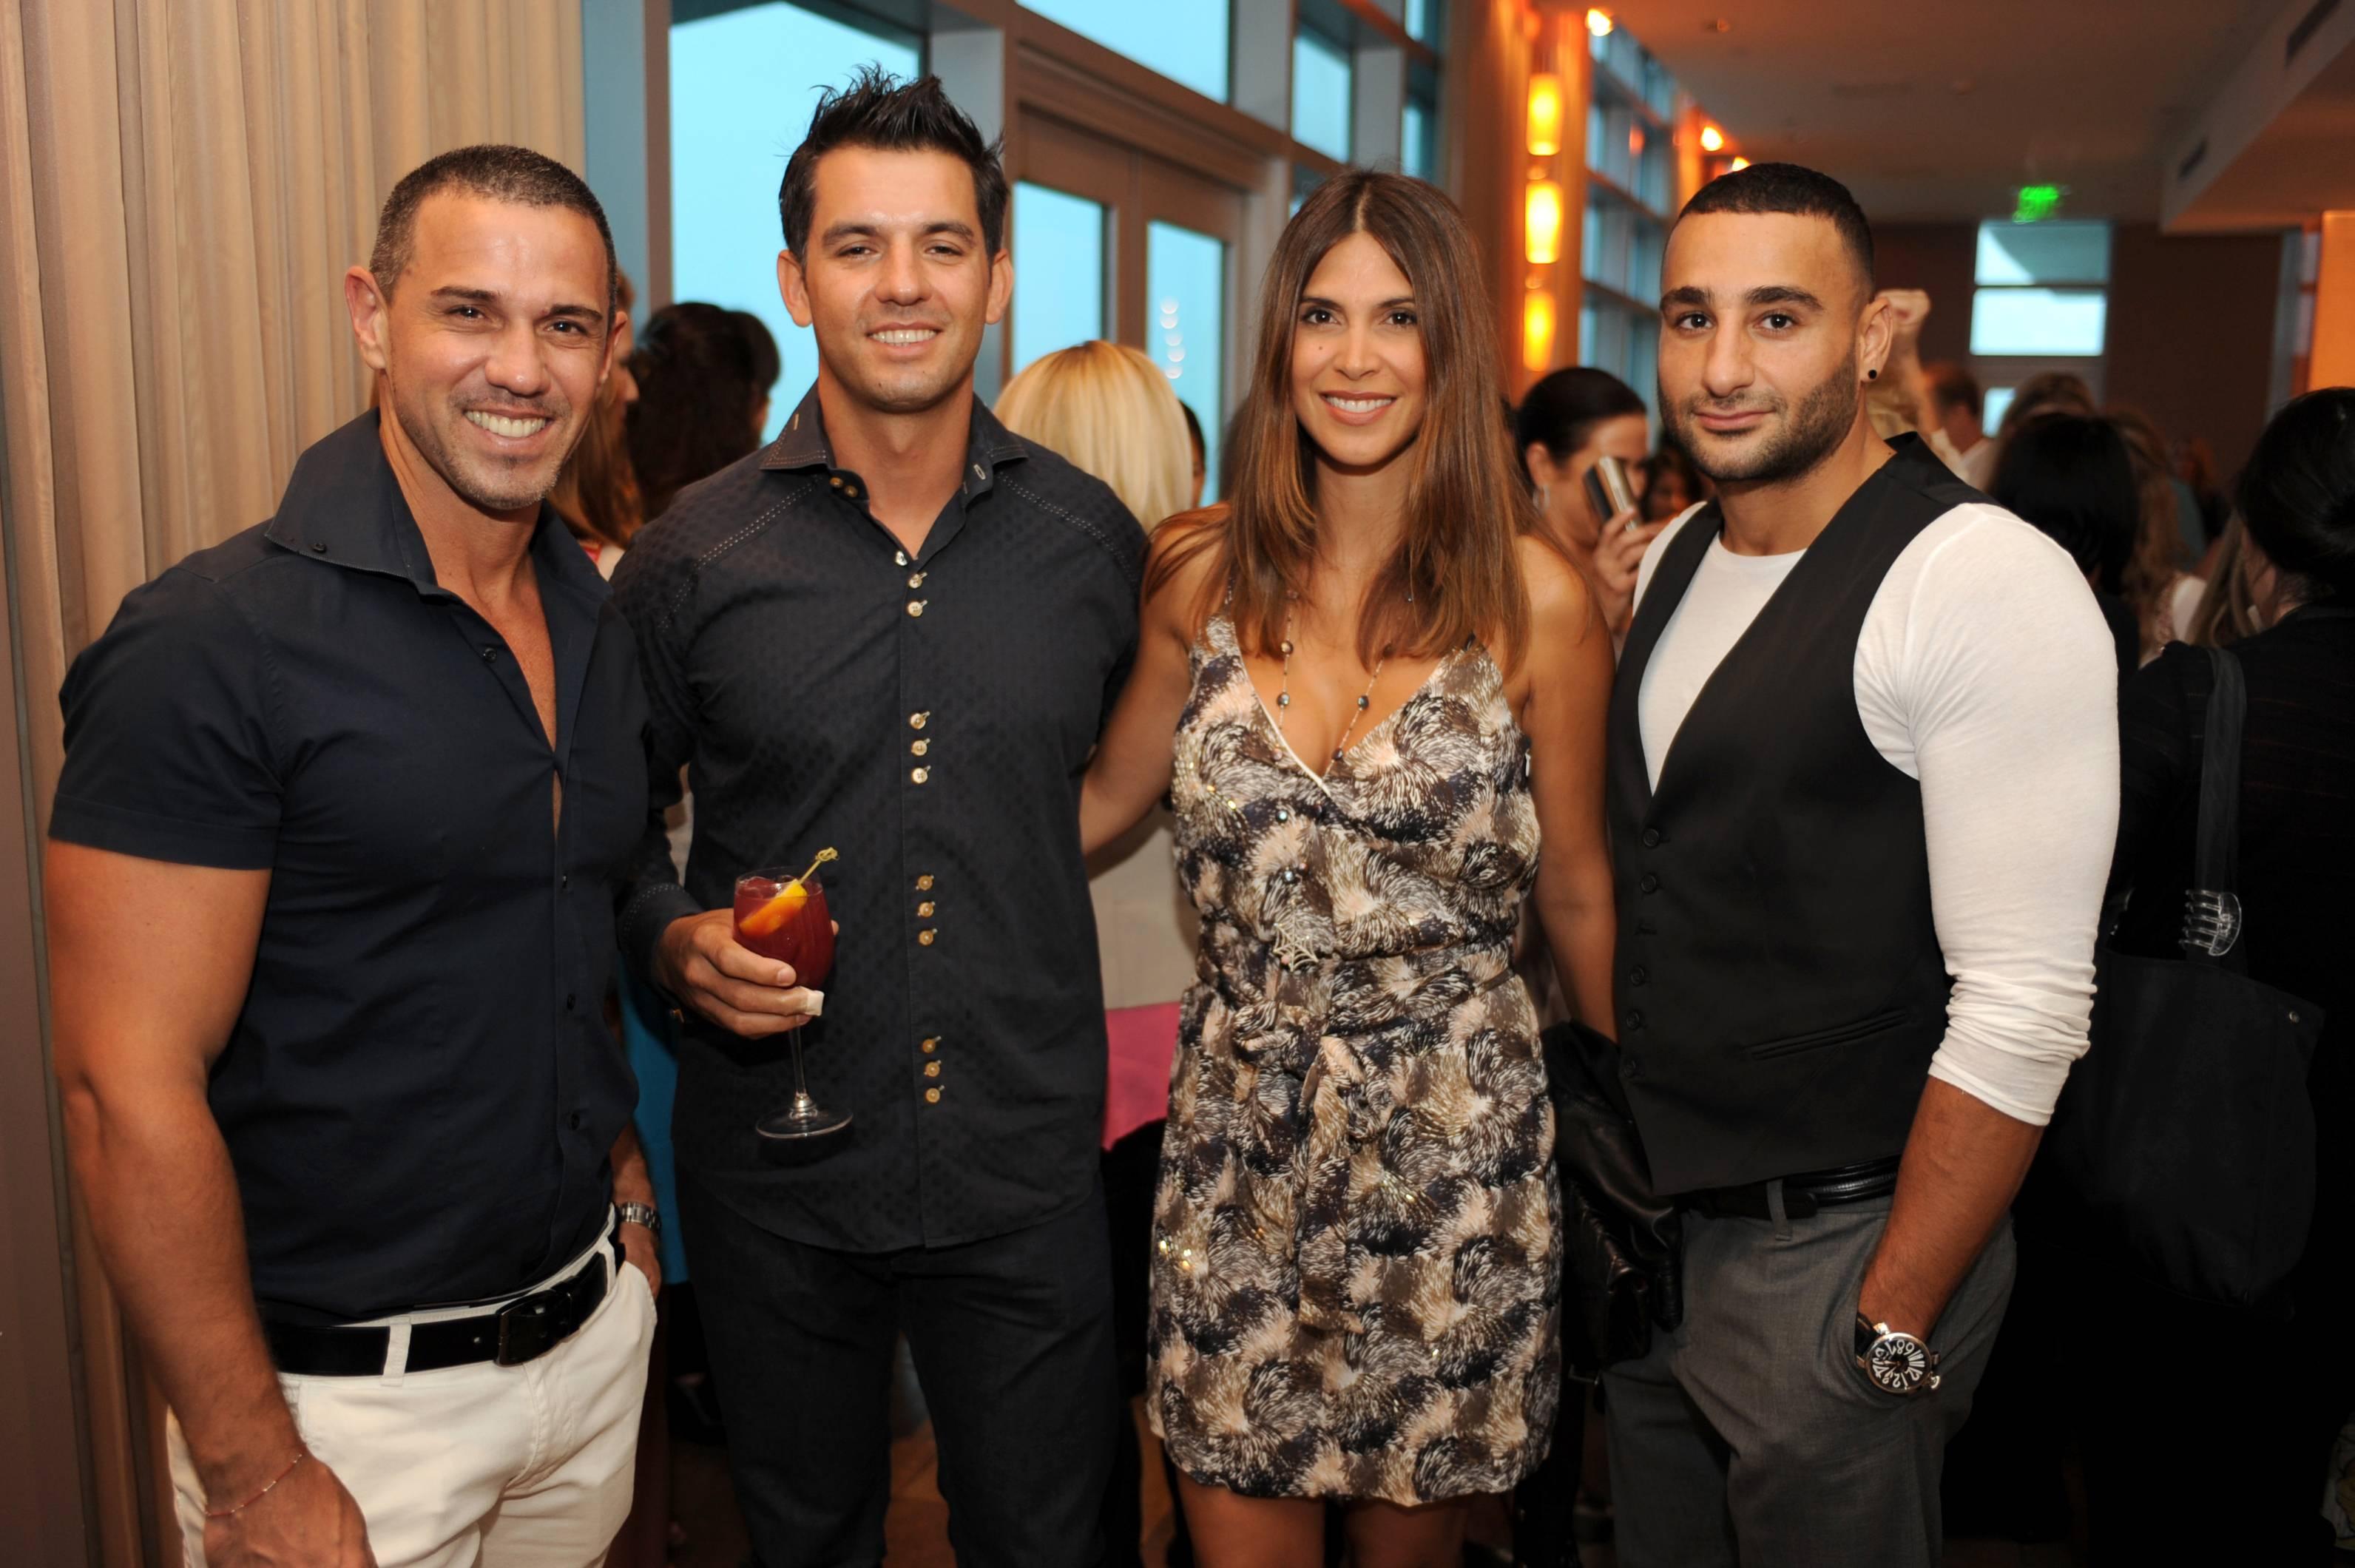 Hernan Arriaga, Fabio Lopes, Alejandra Torres and Mr. Chebat